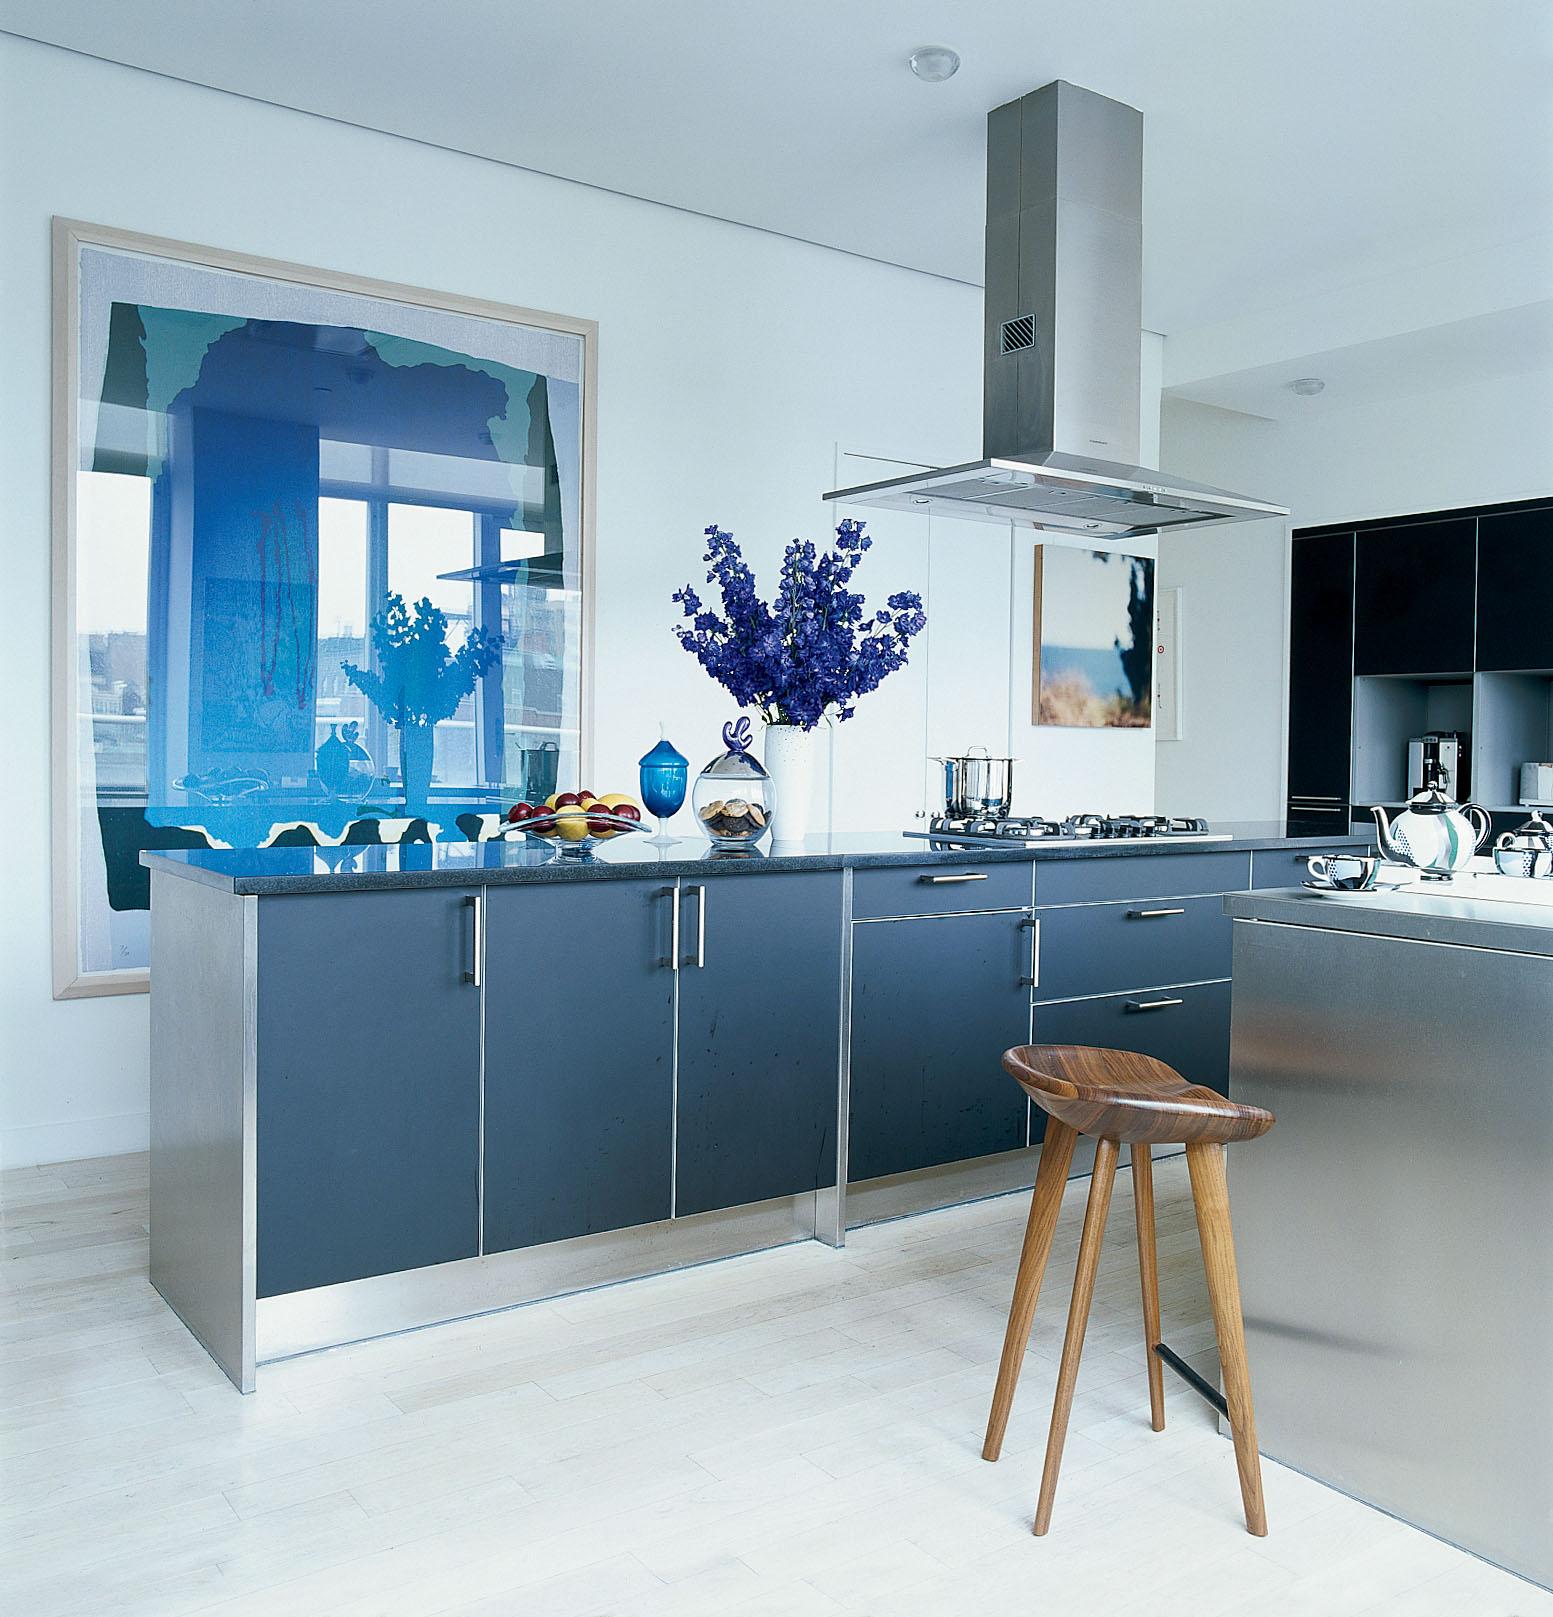 Kitchen Art Nyc: Loft At Urban Glass House